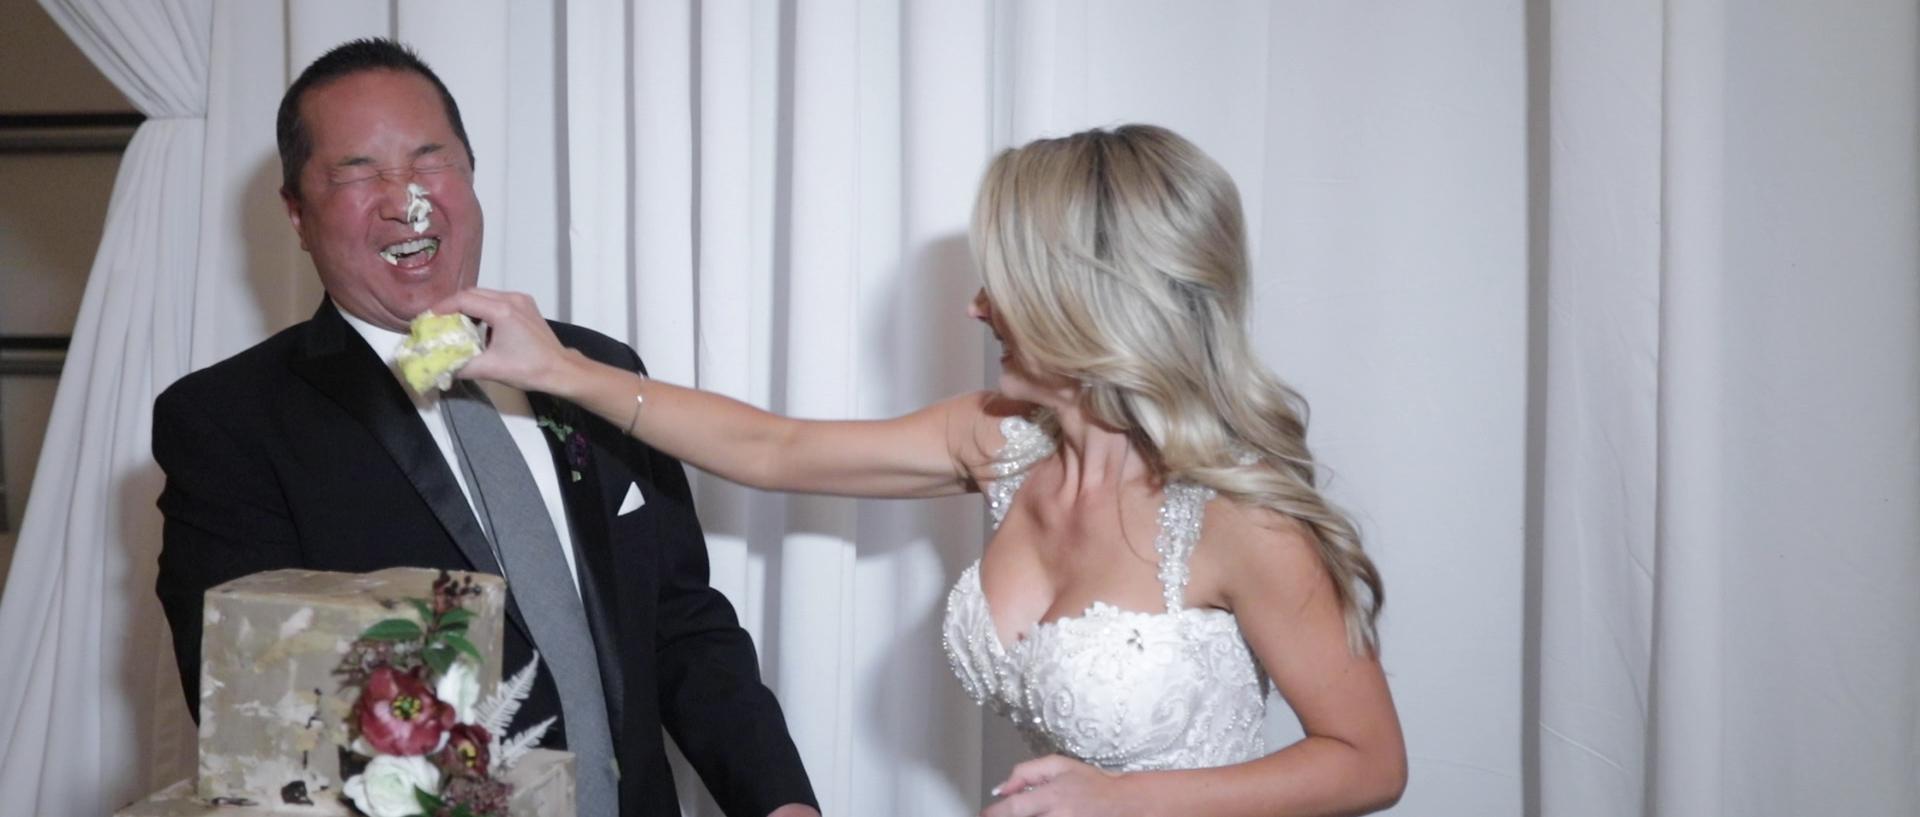 Jessica and Jeffrey Wedding Story.06_39_00_10.Still031.jpg